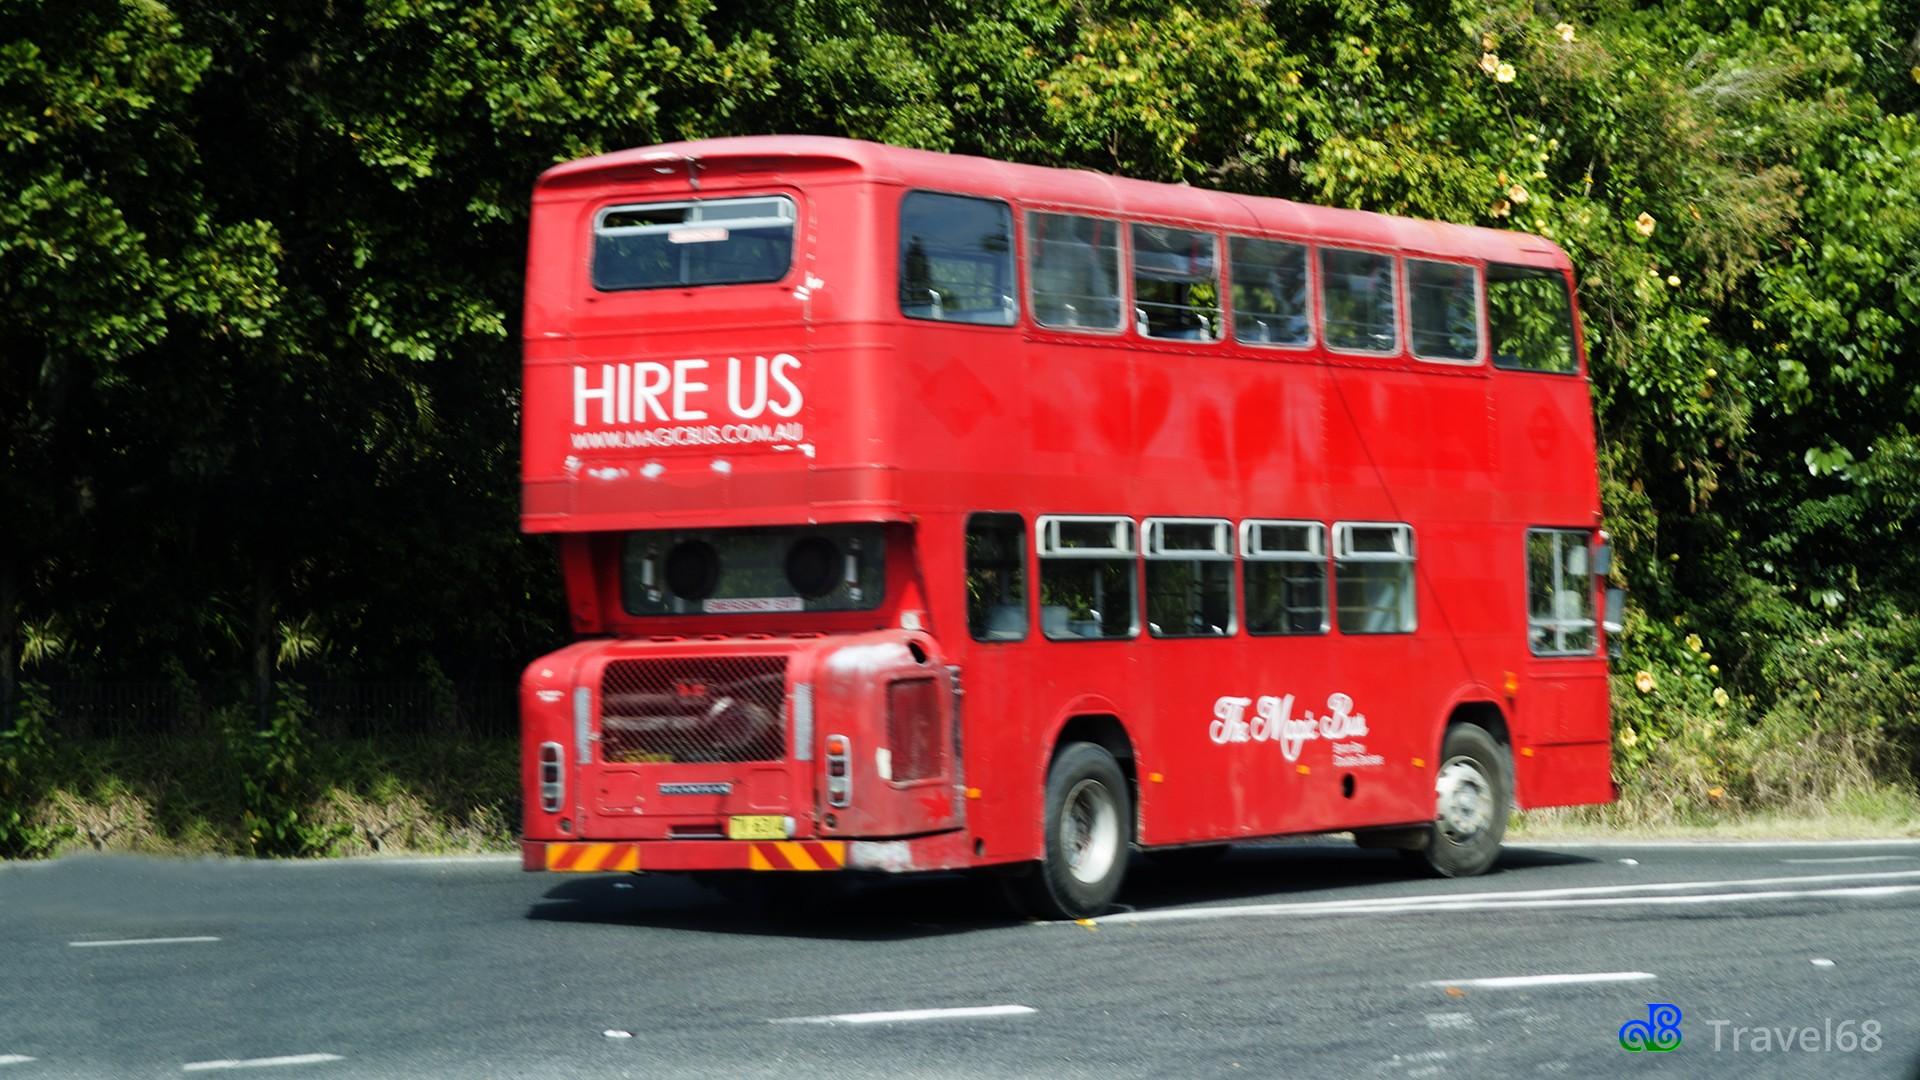 Op weg naar Brunswick Heads kwamen we deze dubbeldekker bus tegen.